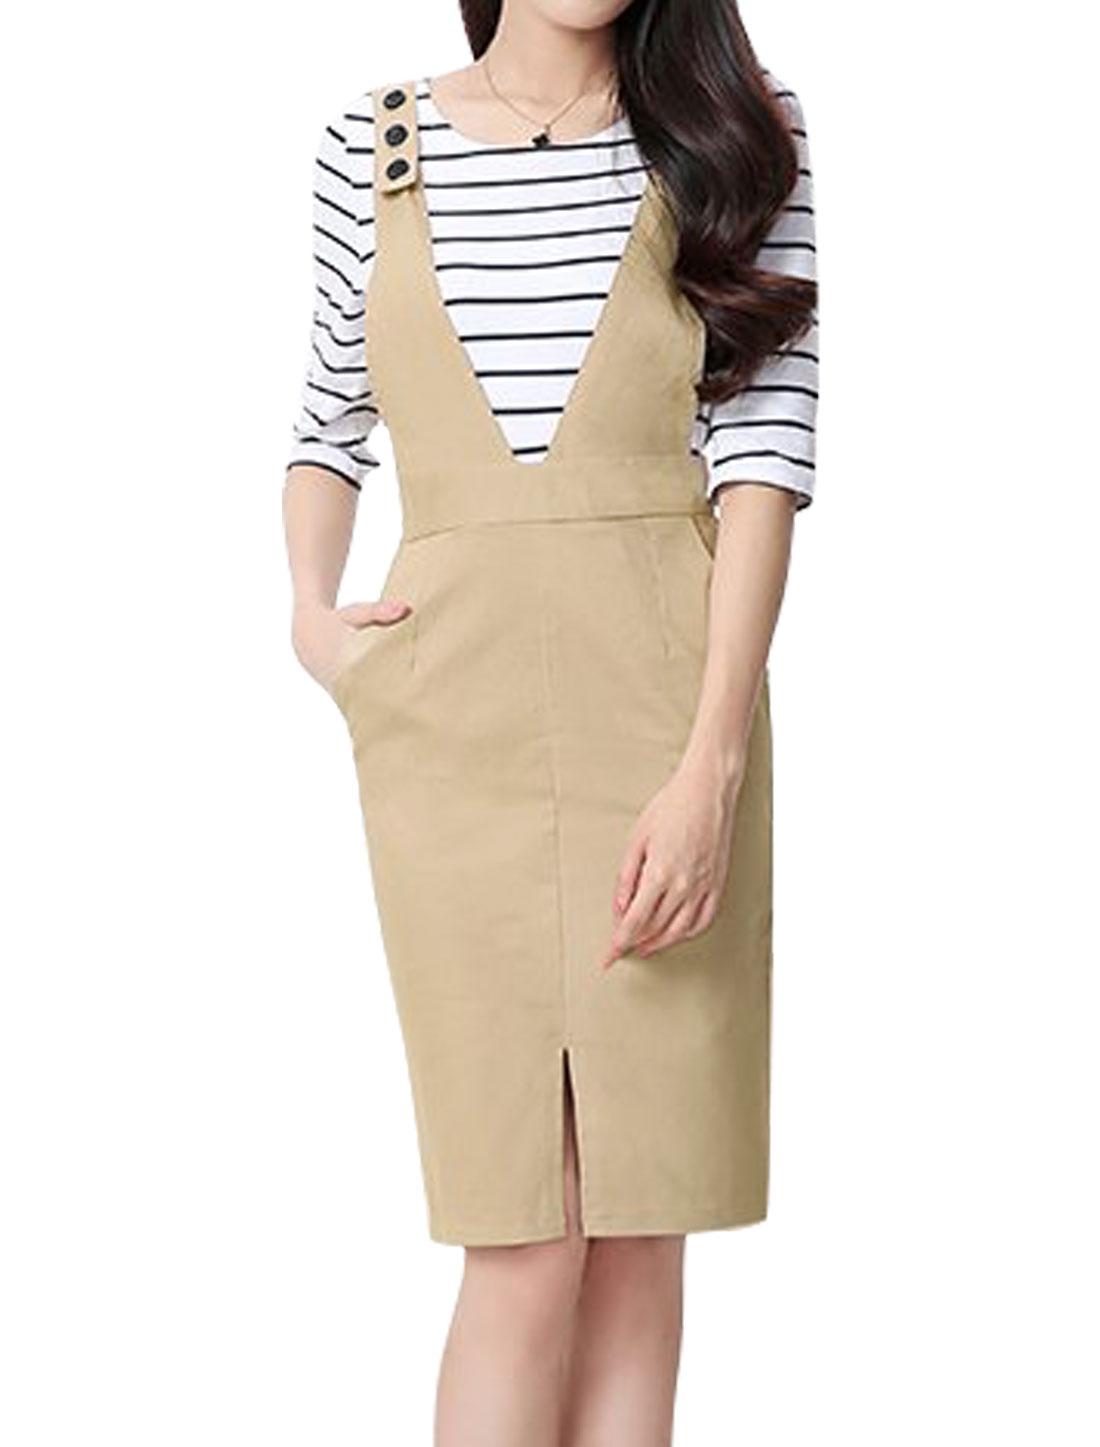 Women Adjustable Strap Split Front Suspender Skirt Beige S